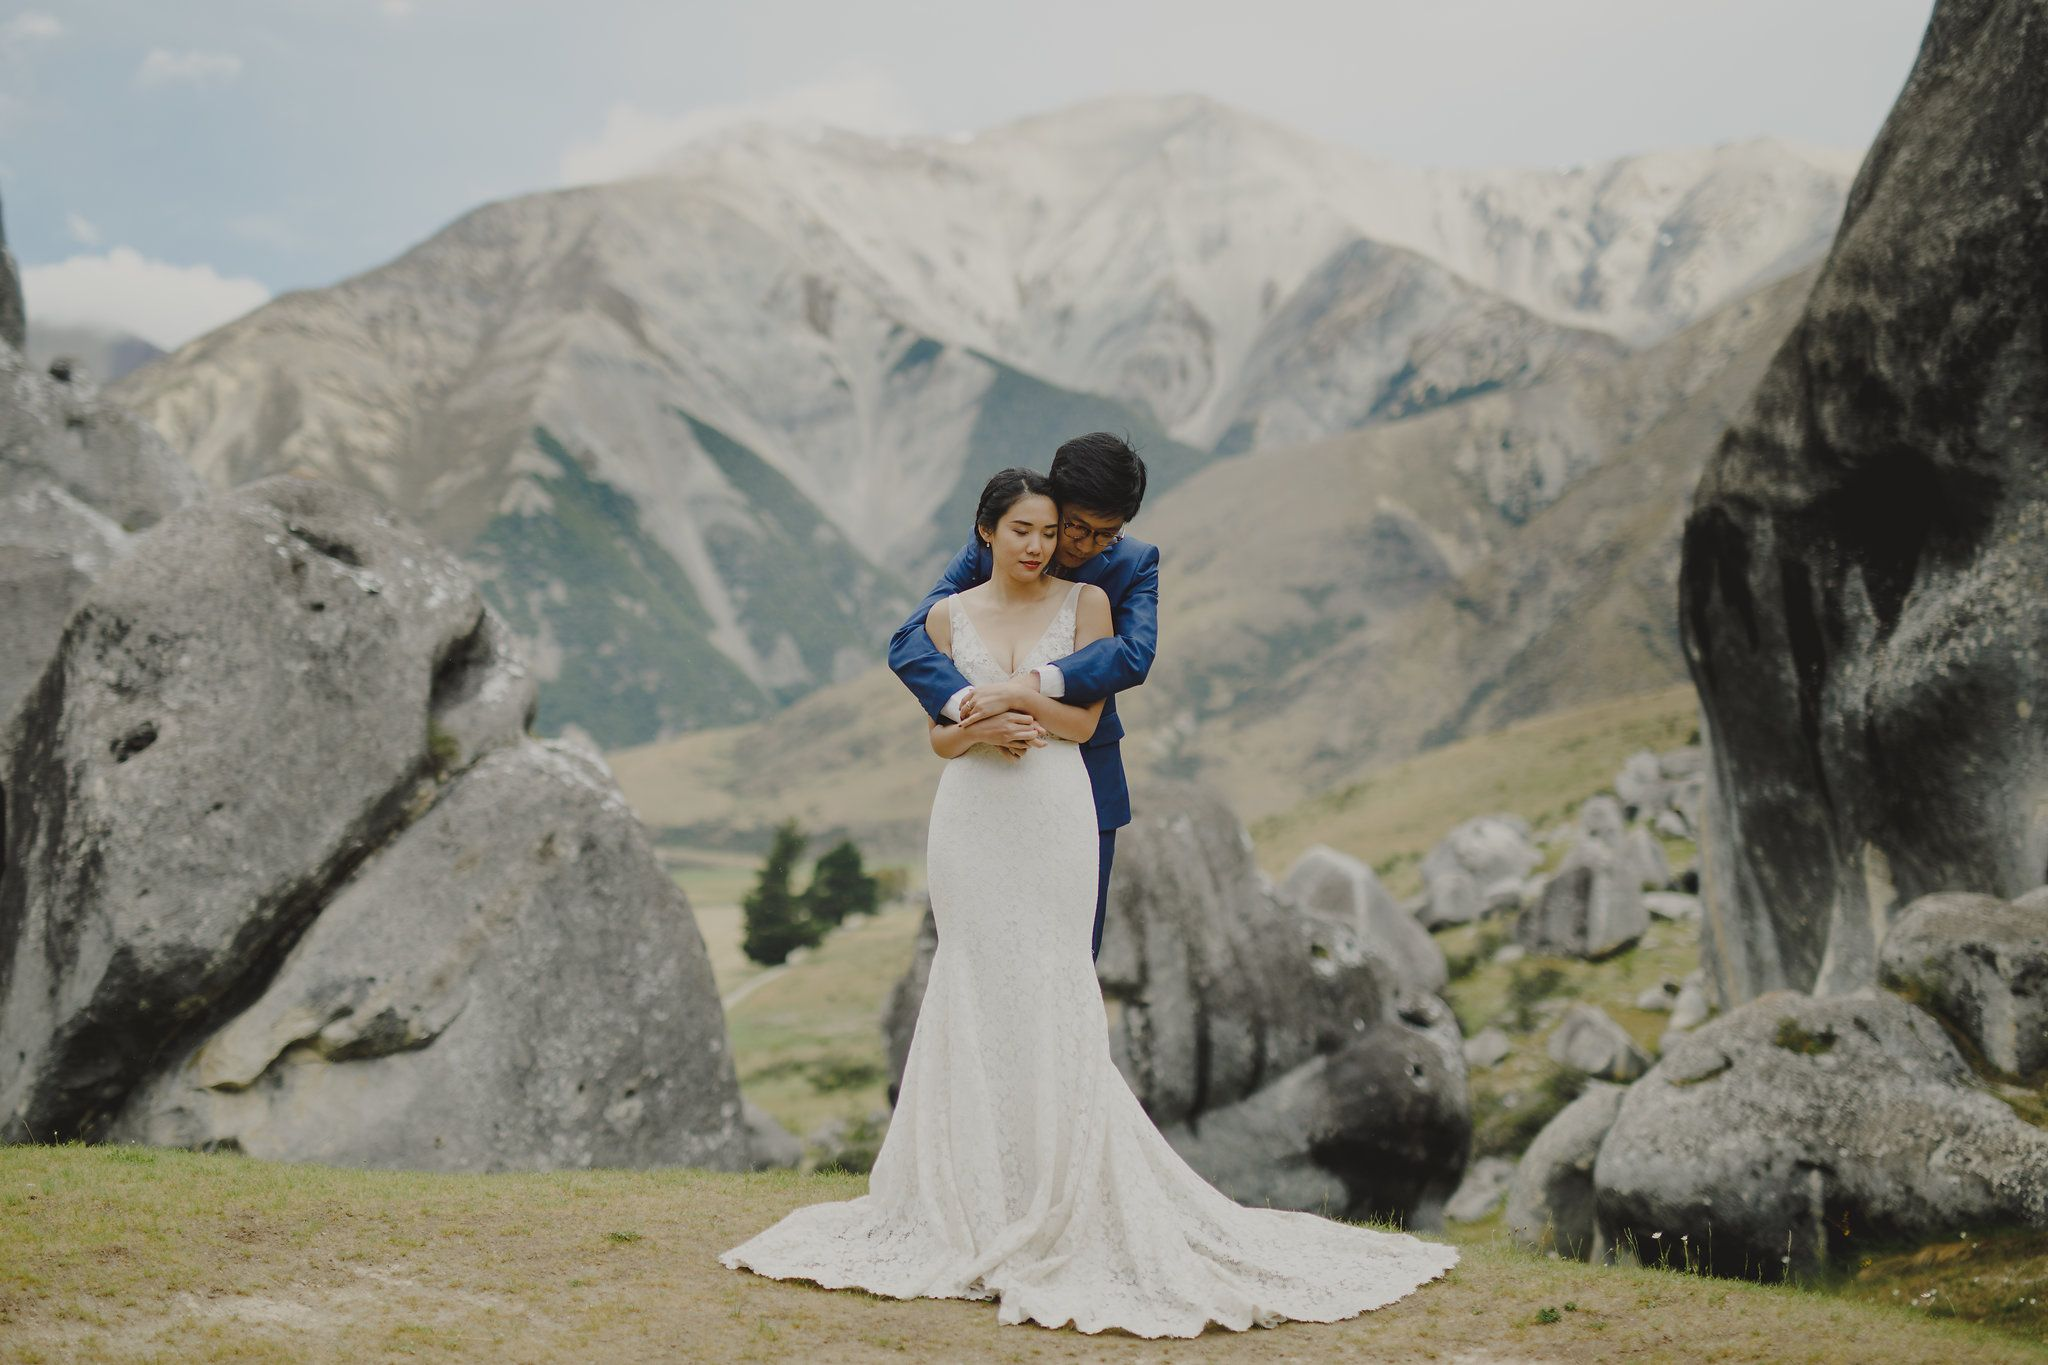 Nigel Bernice 702 Jpg Ball Gown Wedding Dress Top Wedding Registry Items Luxury Wedding